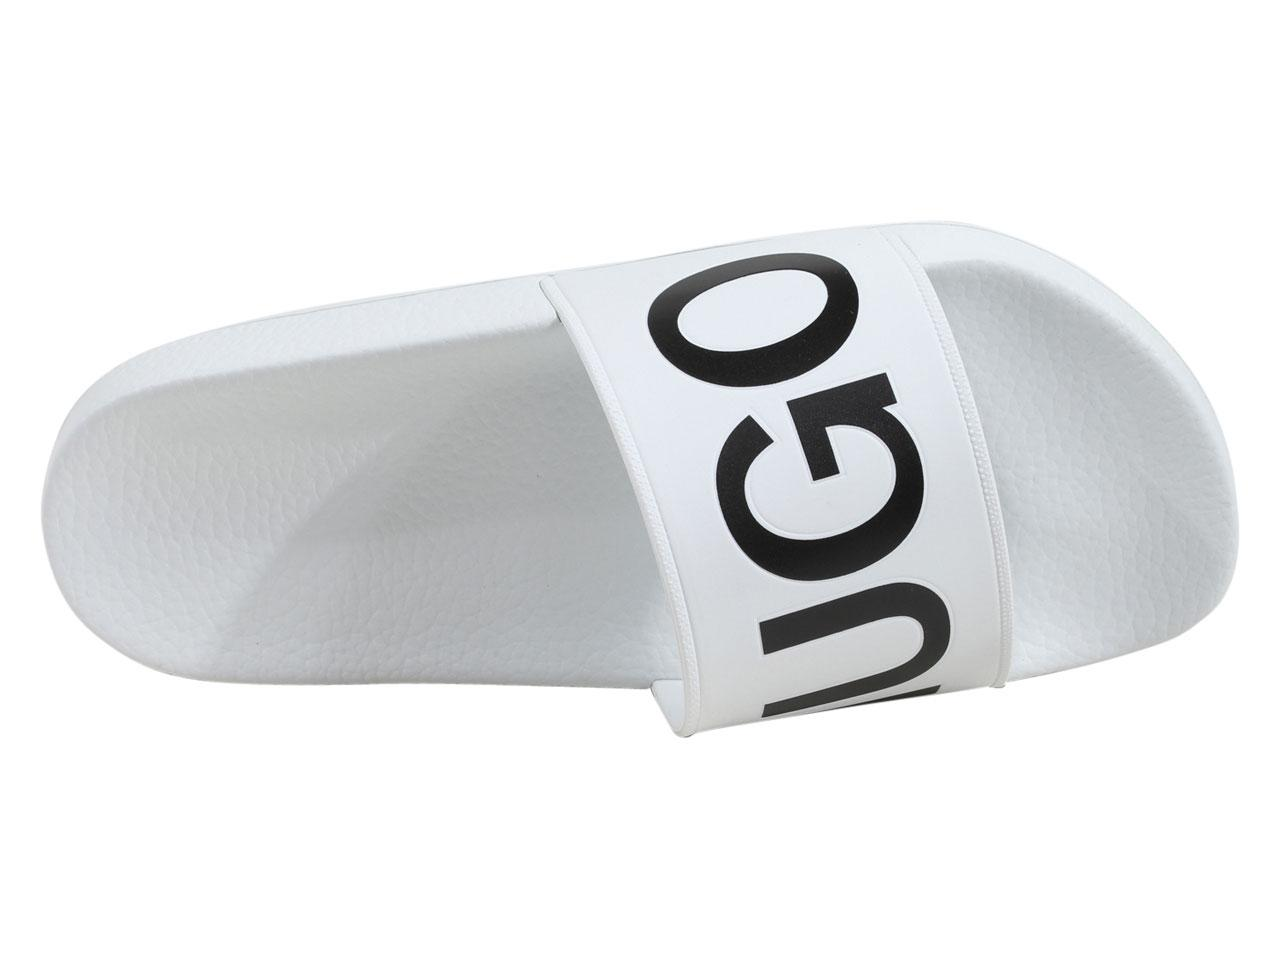 Hugo Boss Herren Timeout-Rb Rutschen Rutschen Rutschen Sandalen Schuhe  6acb44